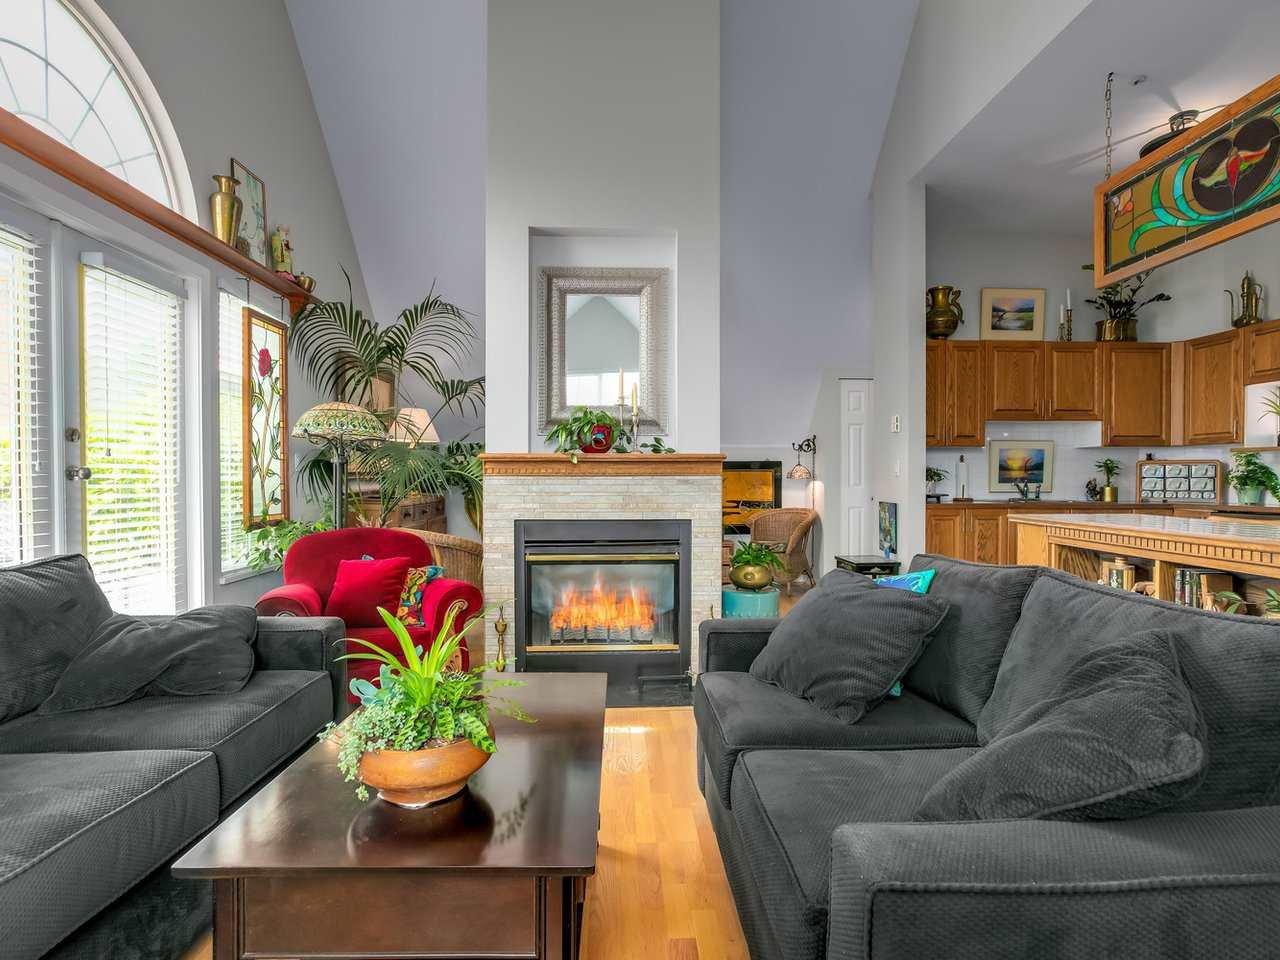 "Main Photo: 410 5556 14 Avenue in Delta: Cliff Drive Condo for sale in ""WINDSOR WOODS"" (Tsawwassen)  : MLS®# R2458802"